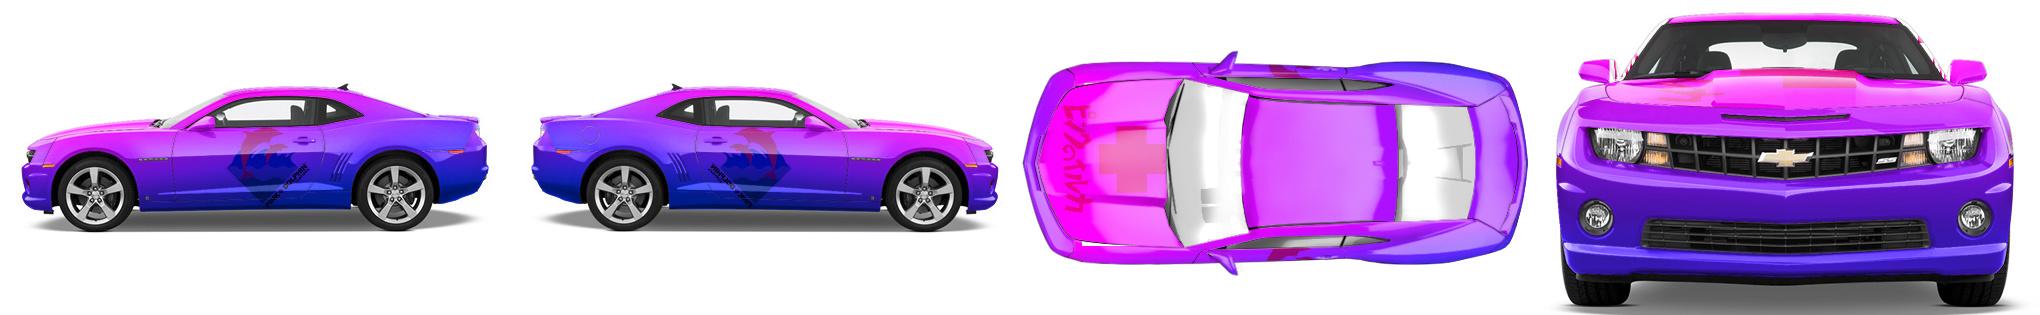 Muscle Car Wrap #13291